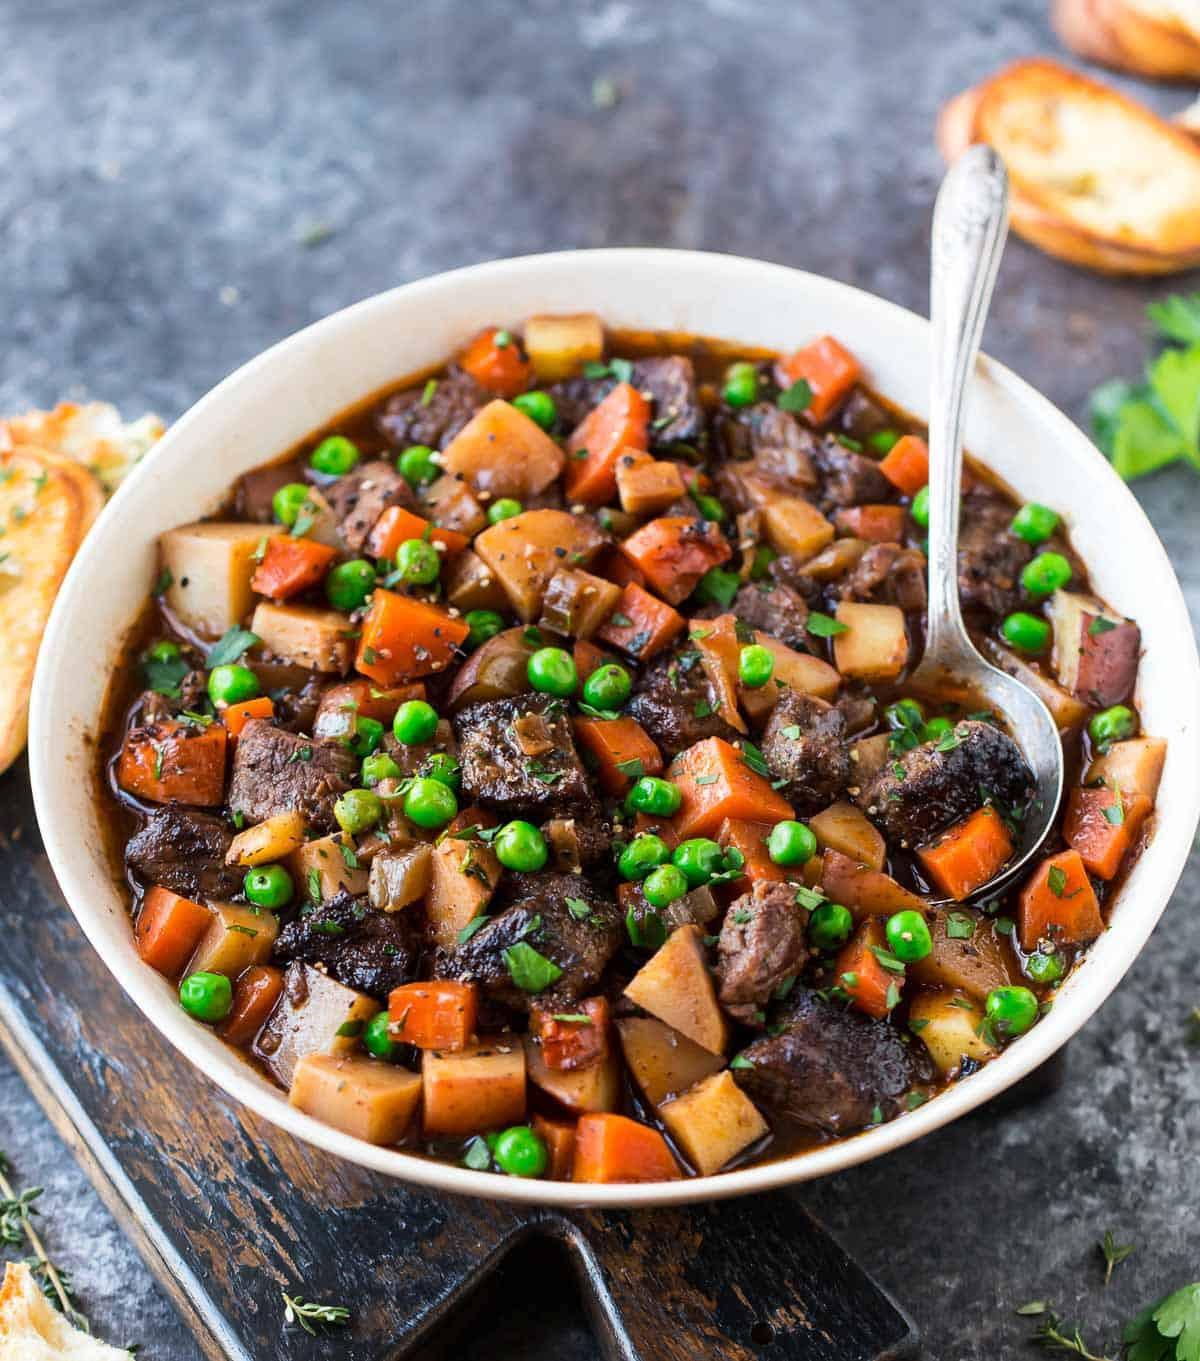 Healthy Crock Pot Recipes With Ground Beef  Crock Pot Beef Stew Recipe